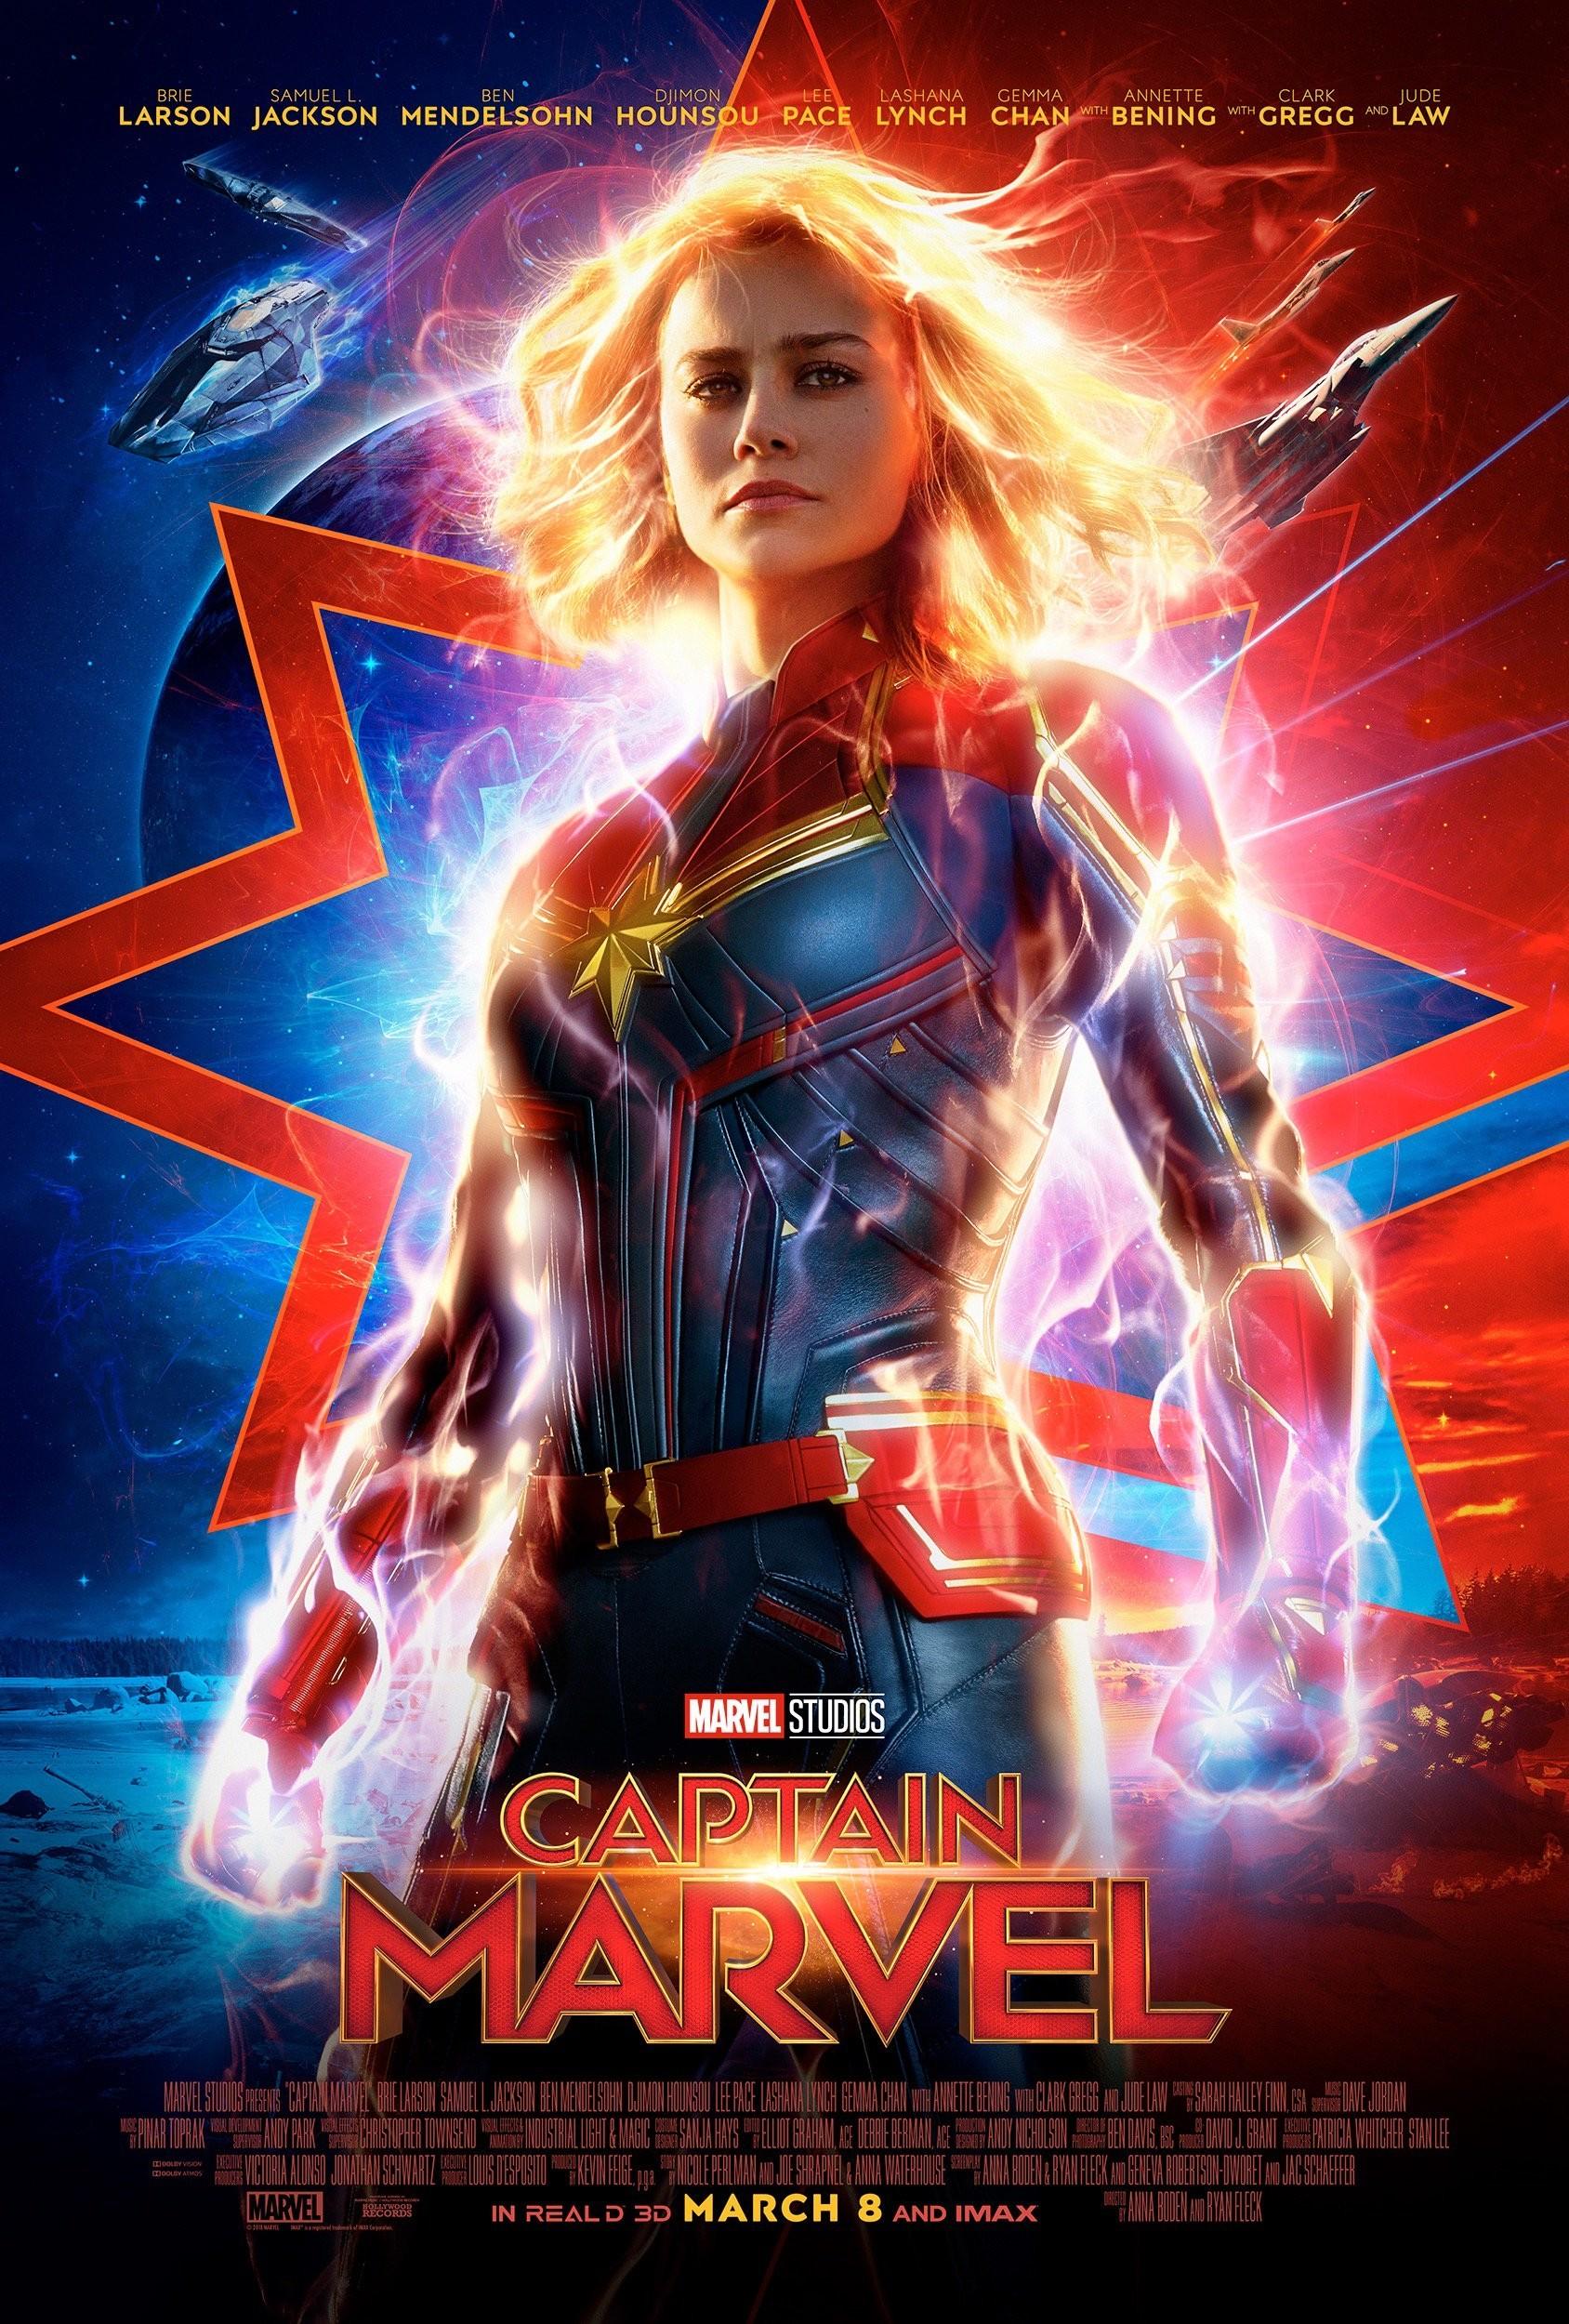 captain marvel reviews - metacritic